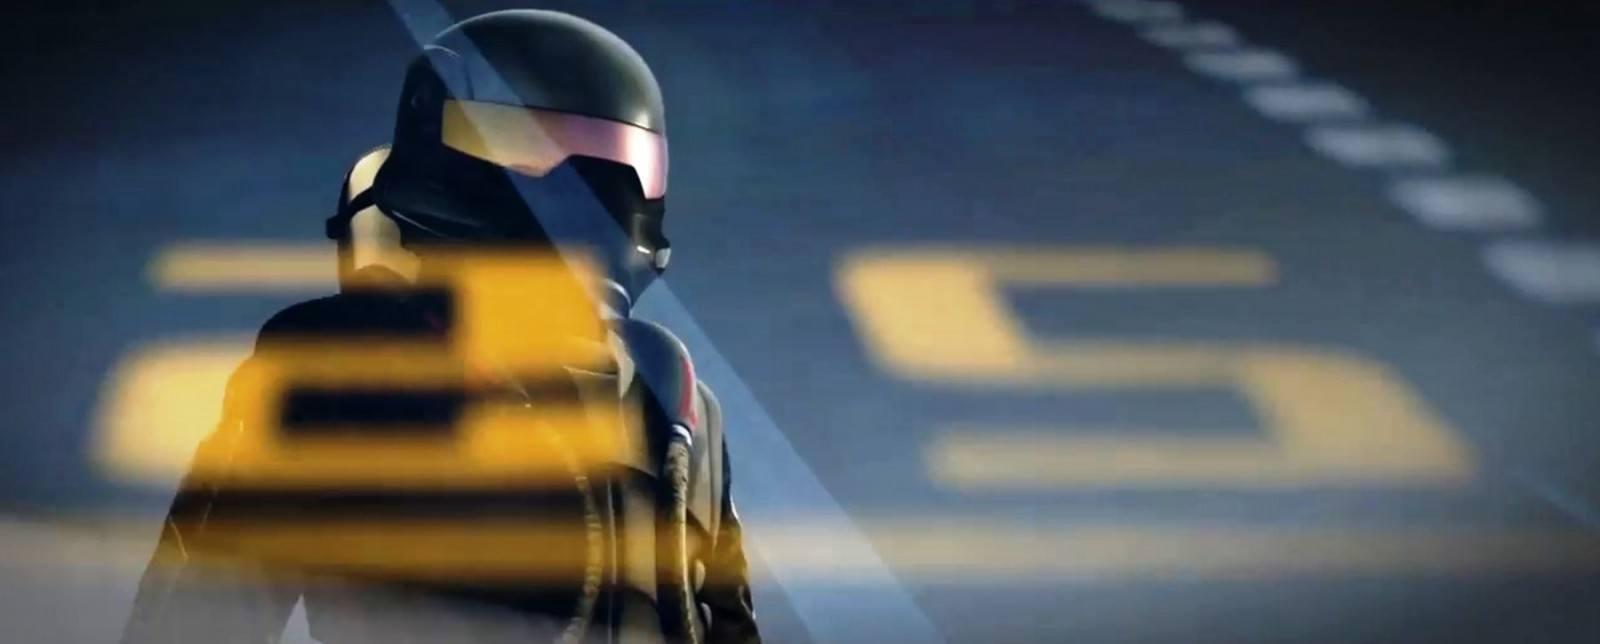 2015 SRT Tomahawk Vision Gran Turismo 3